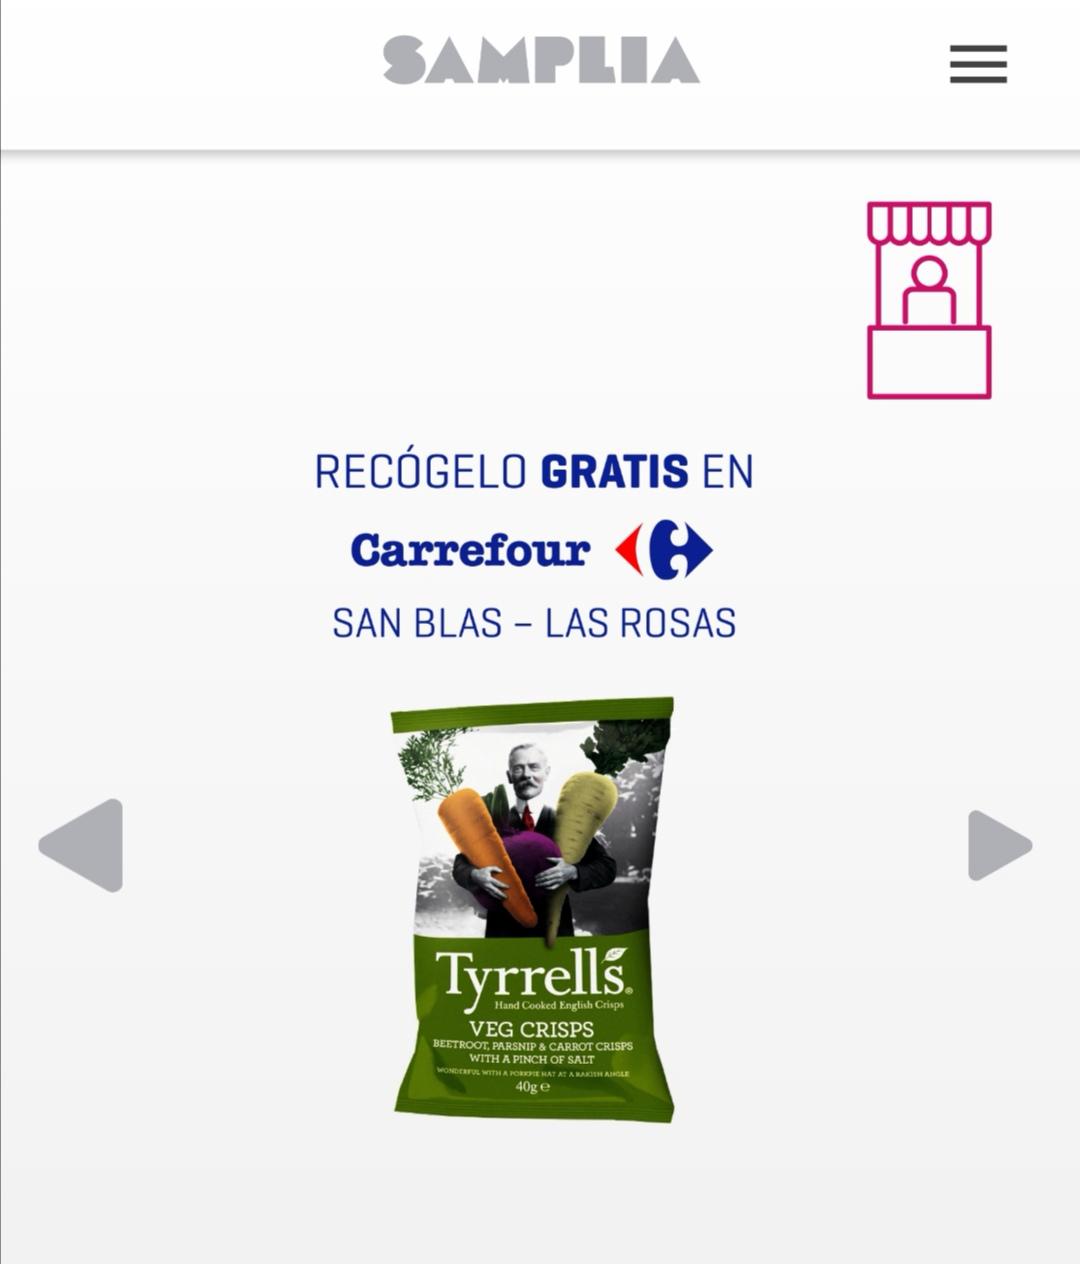 MUESTRA GRATIS TRYRRELS SAMPLIA SAN BLAS-MADRID